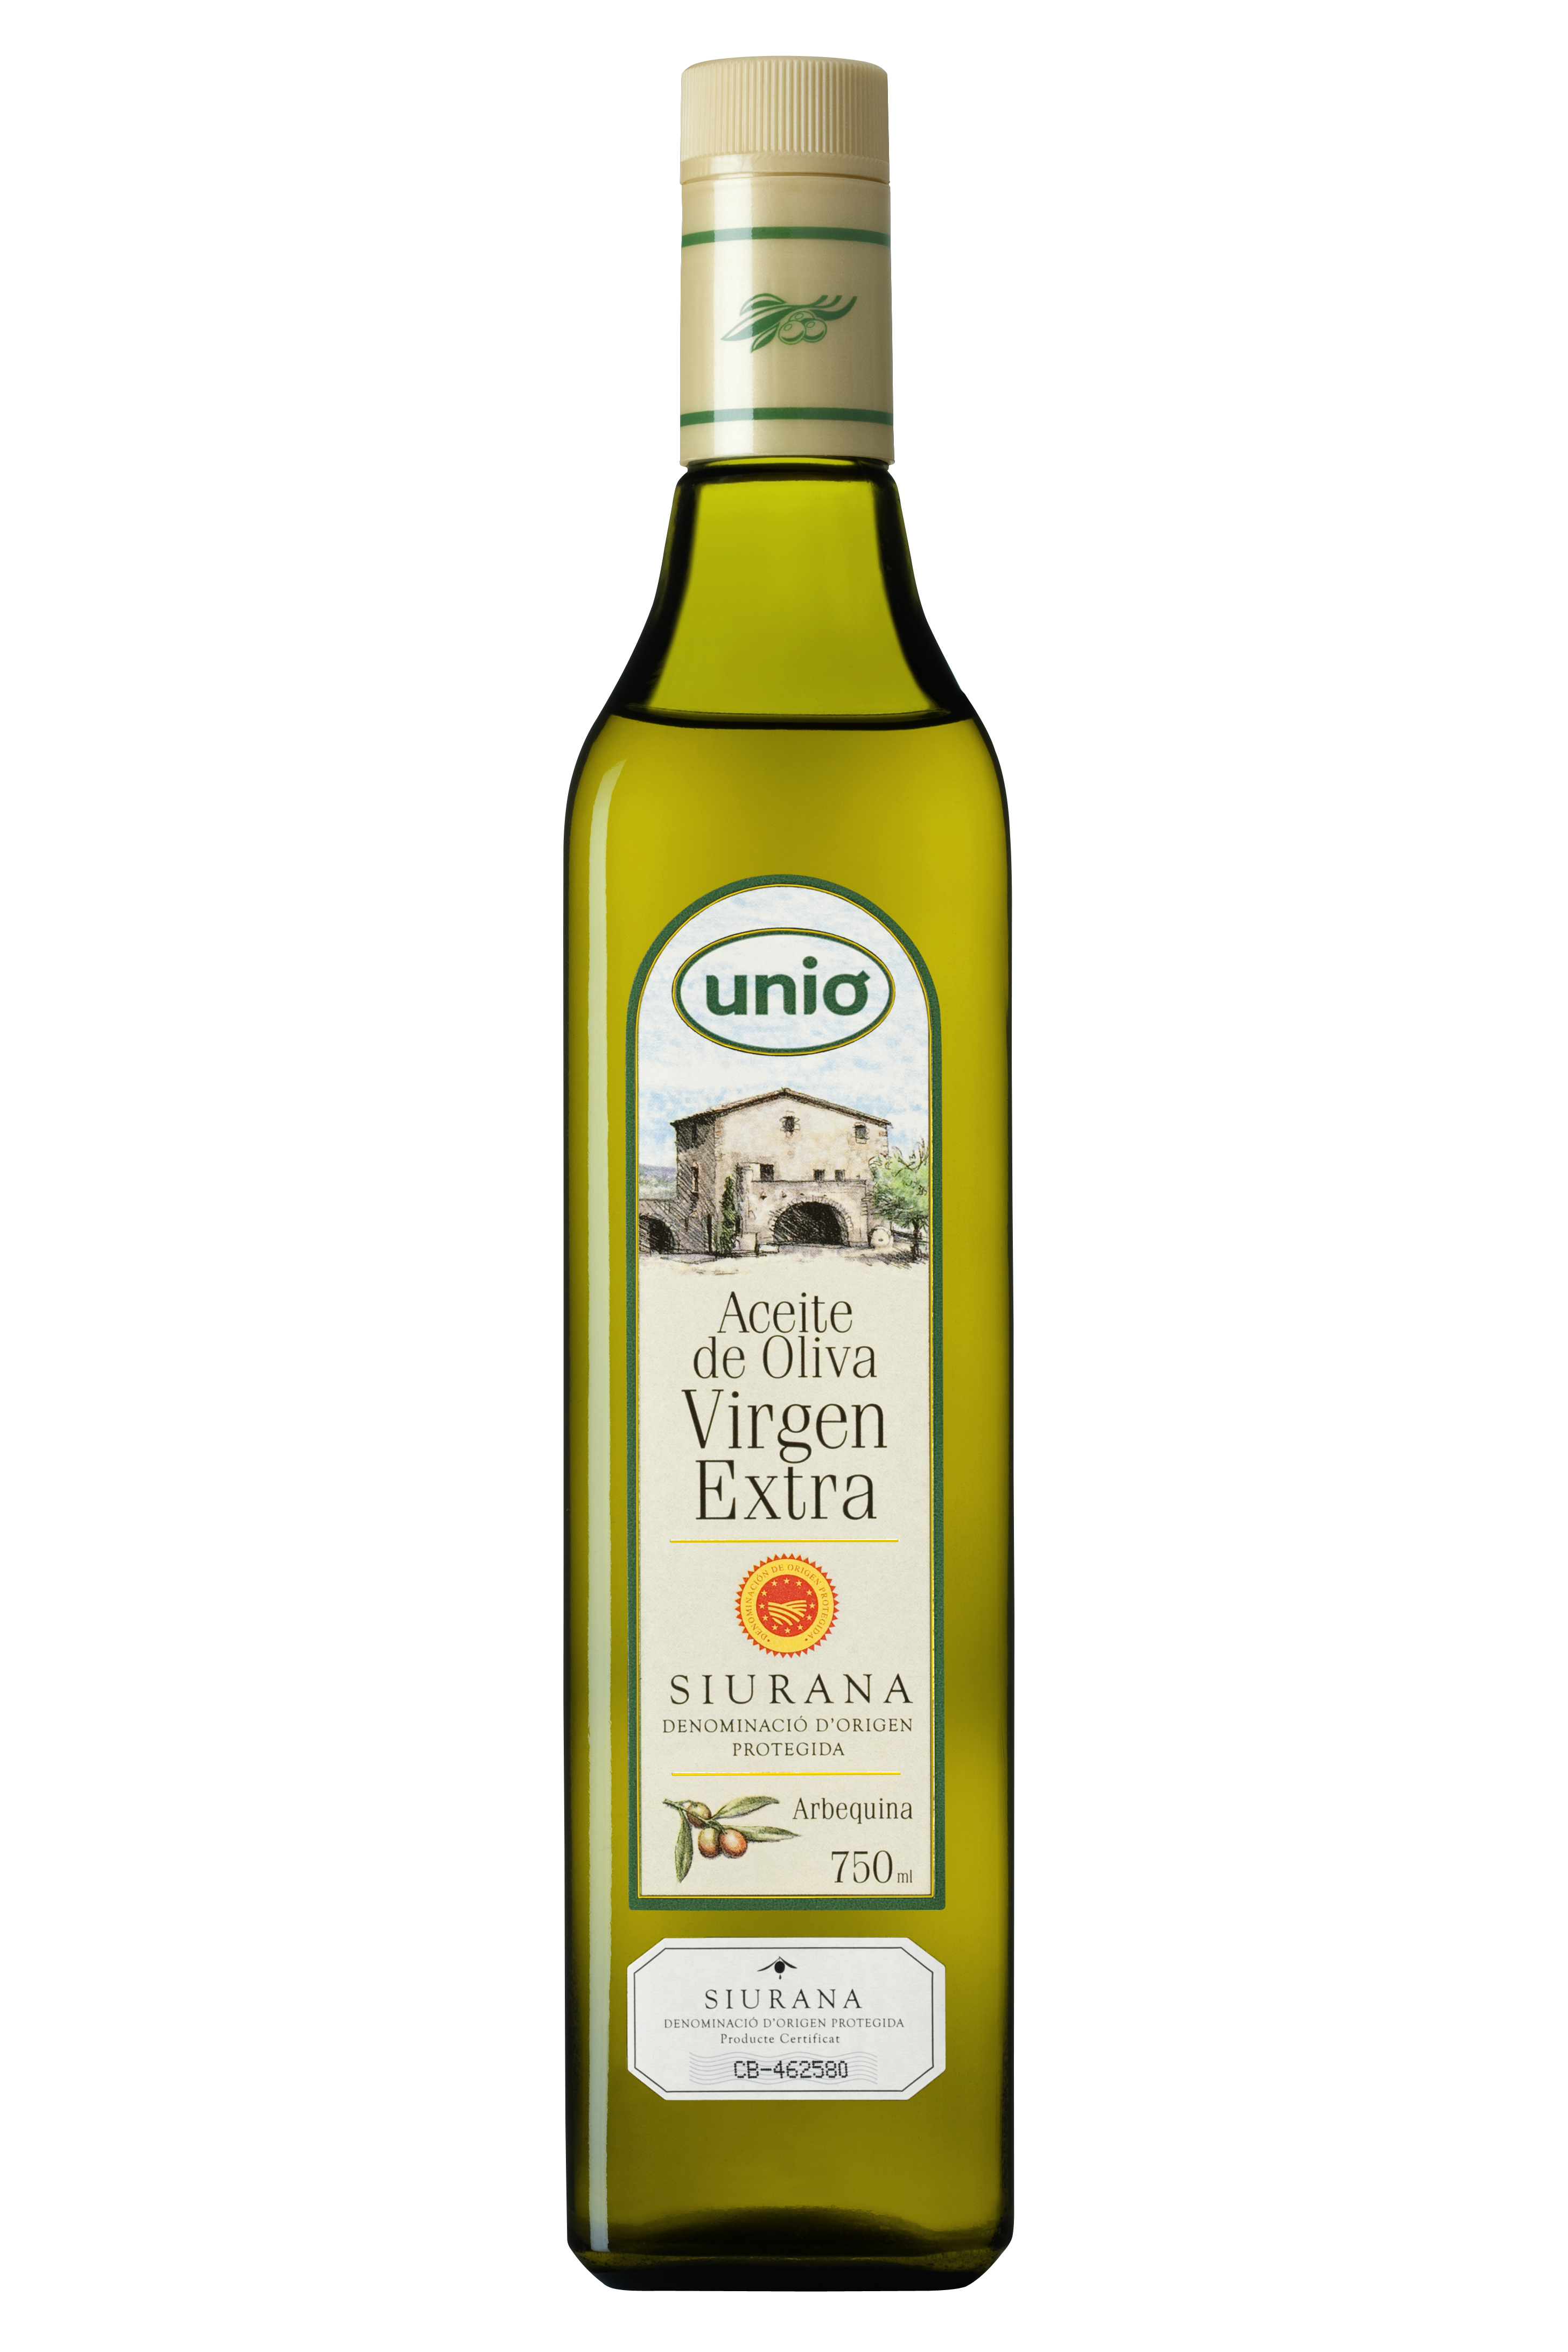 Unio-origen-750-ml-dop-siurana